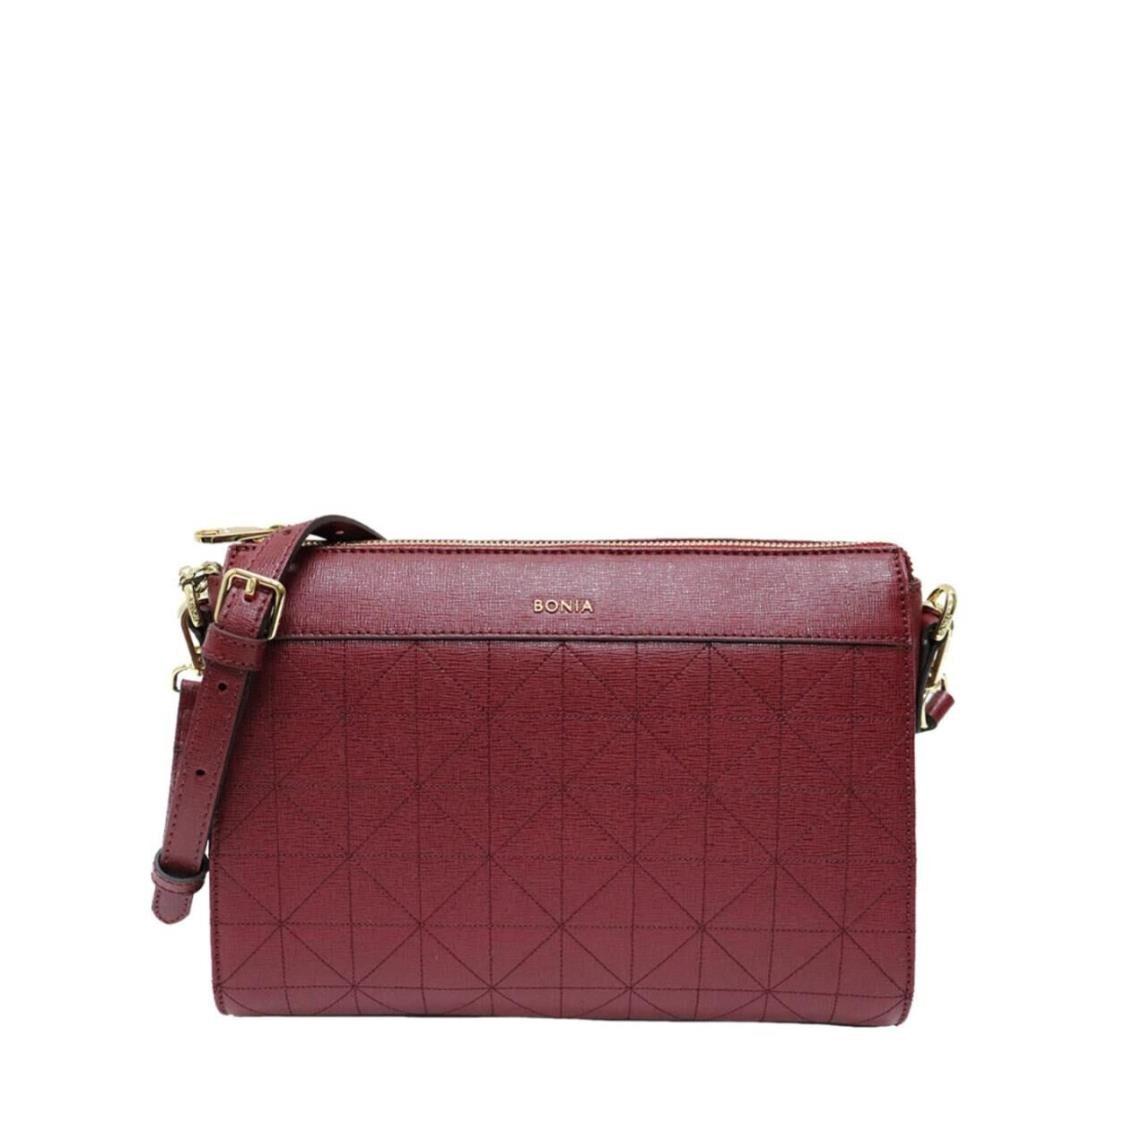 Bonia Crossbody Bag 801417-001-14